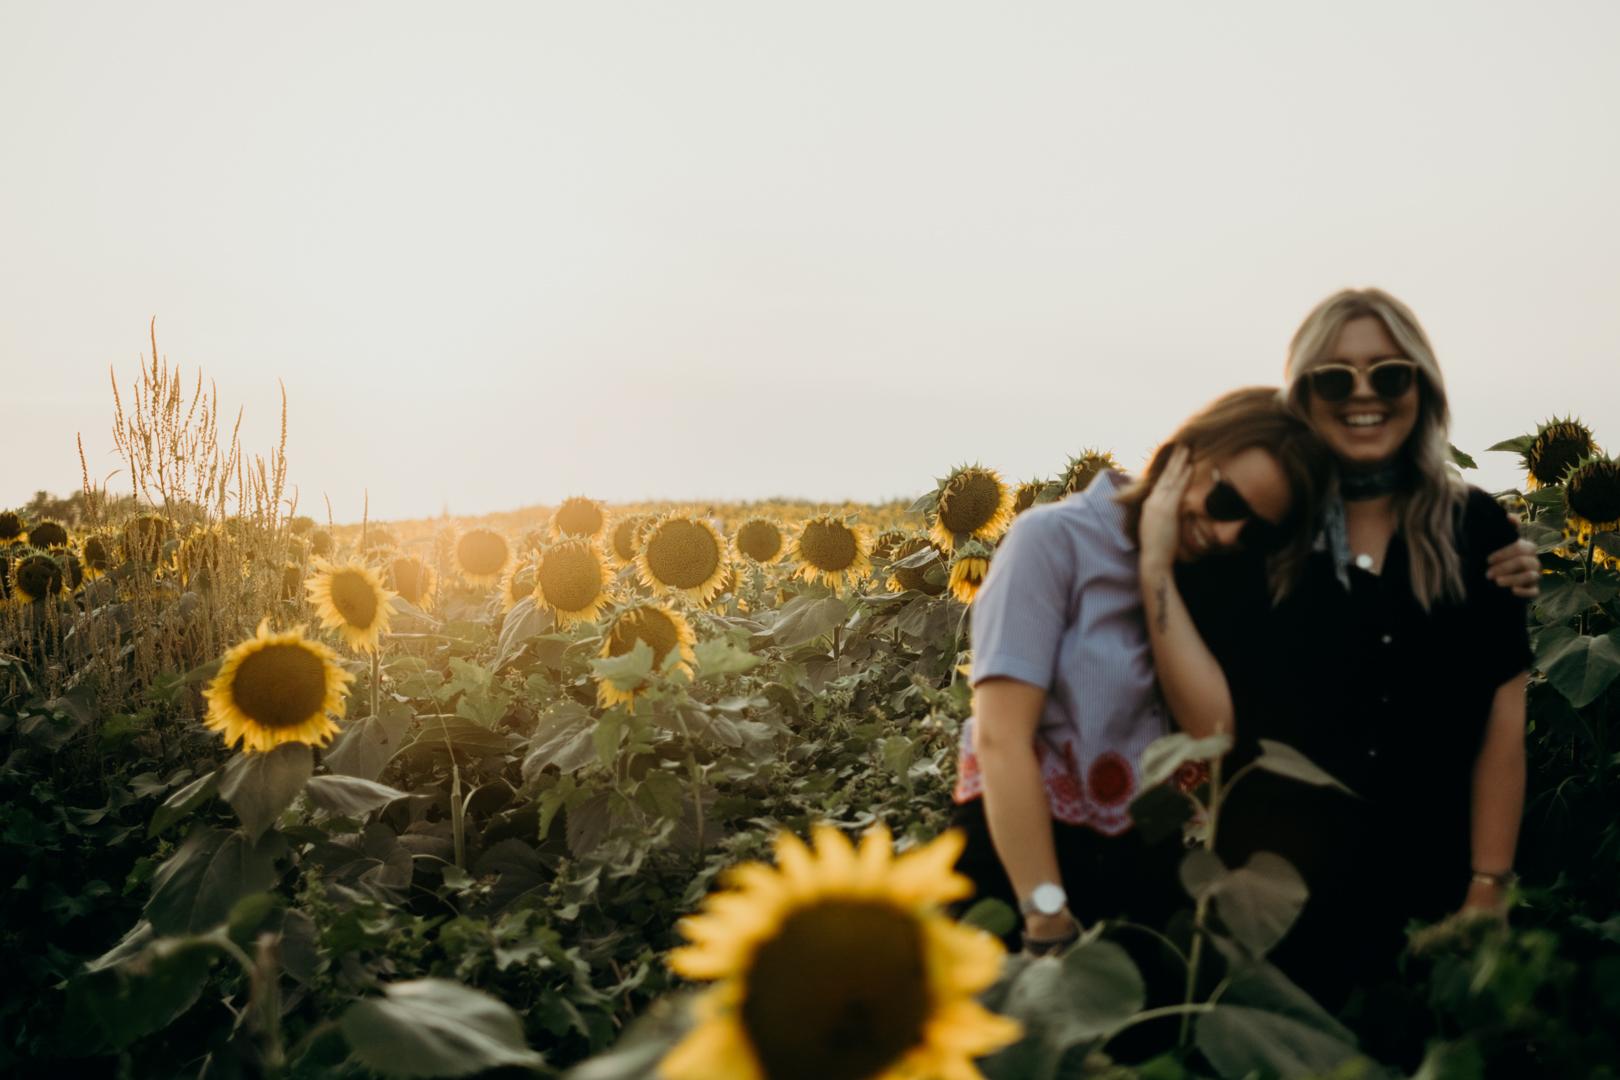 20170909_Grinters Farms Sunflower Fields Lawrence Kansas__20.jpg